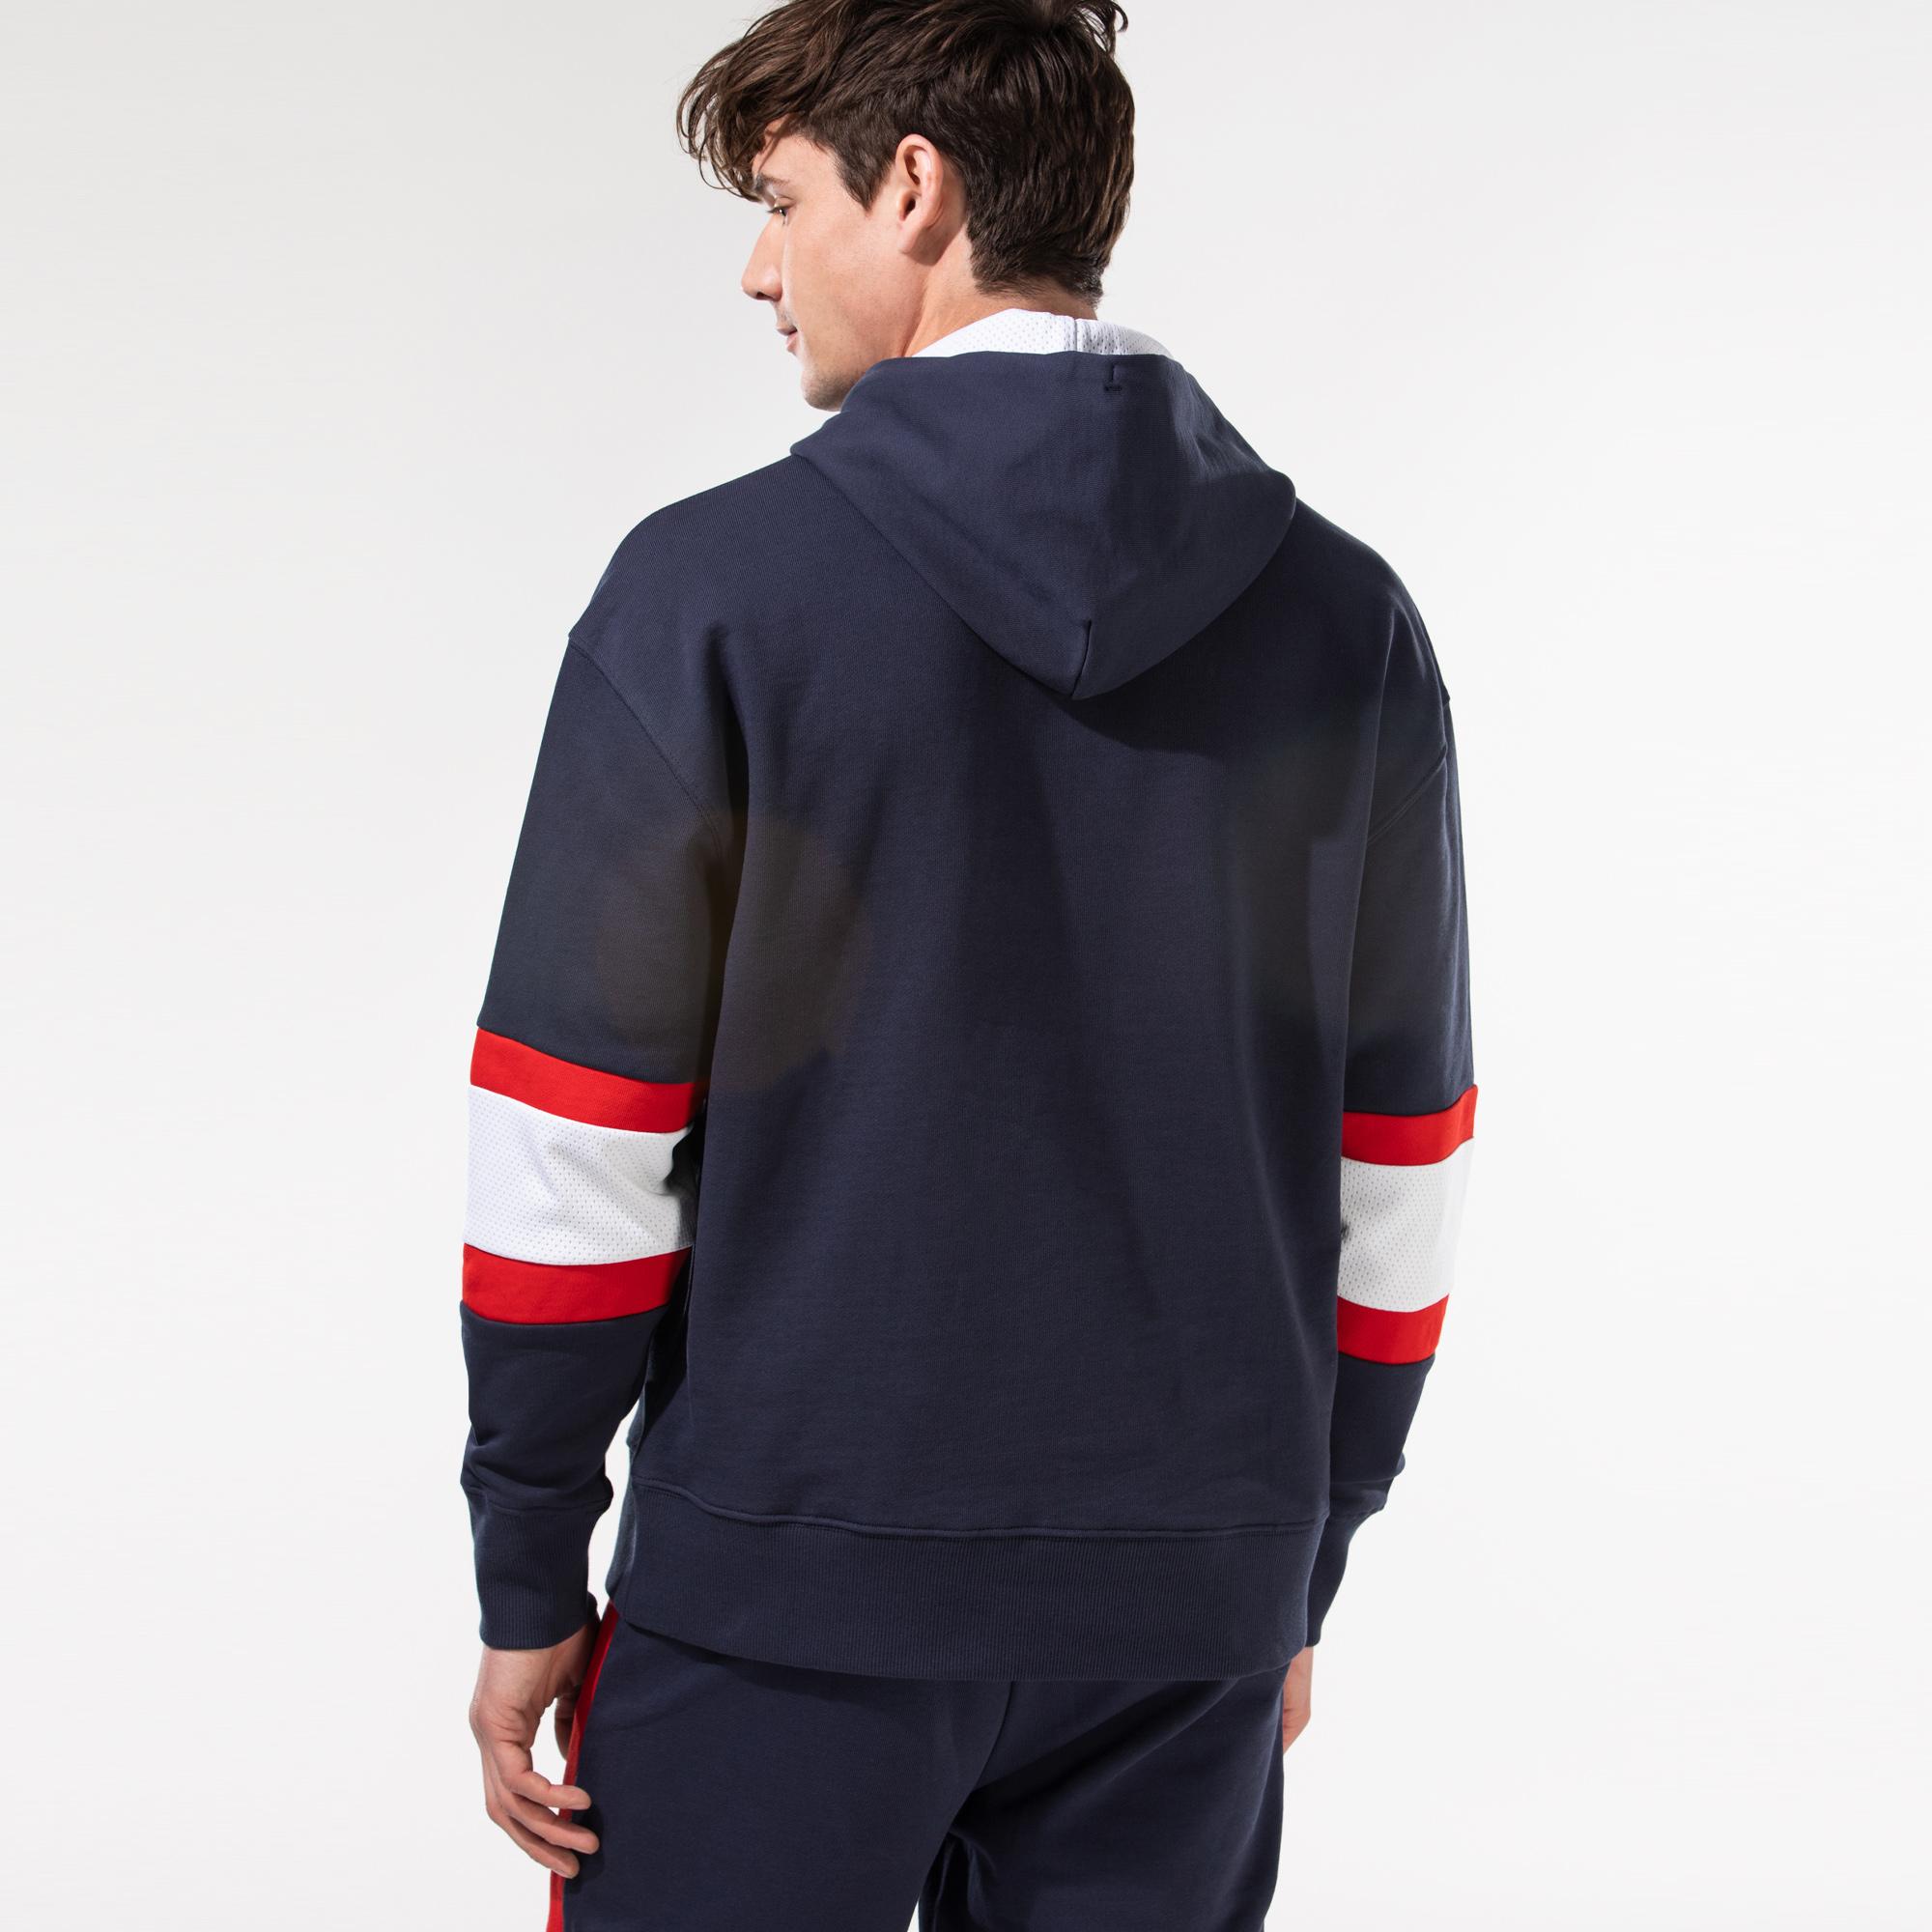 Tommy Hilfiger TJM RWB Erkek Lacivert Sweatshirt